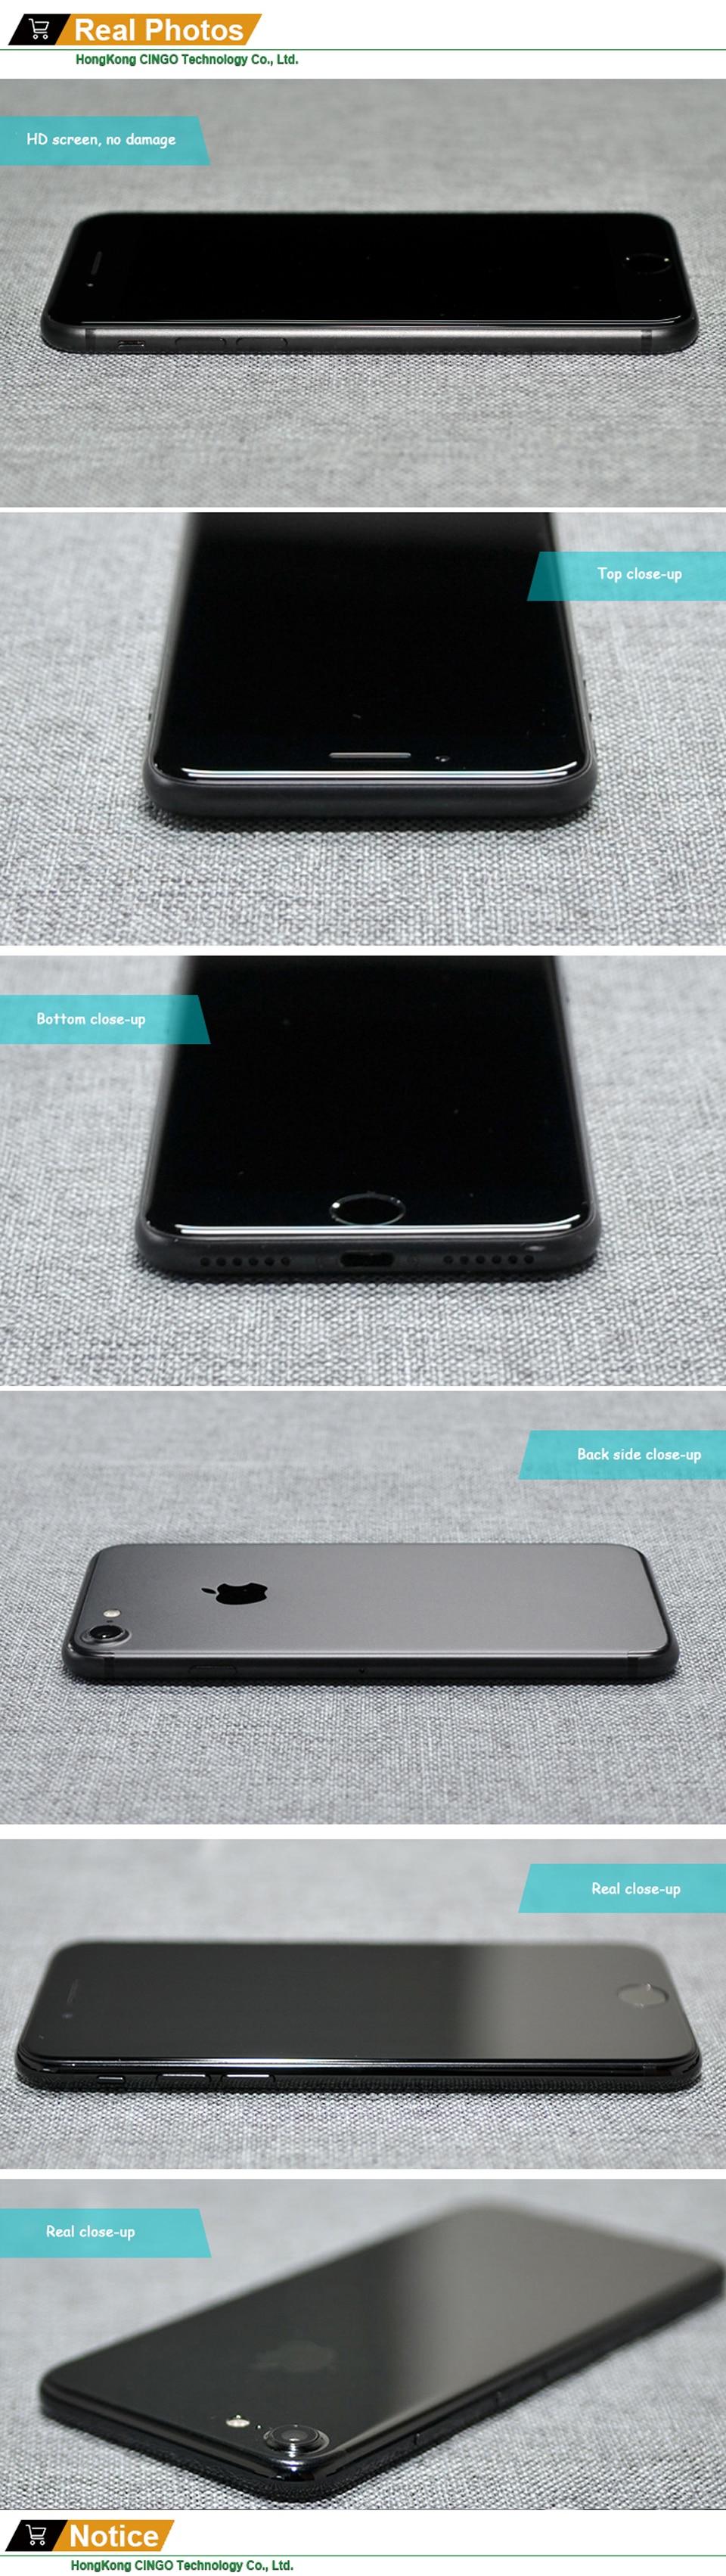 Hdd307ae1a34f4b8f946642fd85560a77n Unlocked Apple iPhone 7 4G LTE Cell Phone 32/128GB/256GB IOS 12.0MP Camera Quad-Core Fingerprint 12MP 1960mA